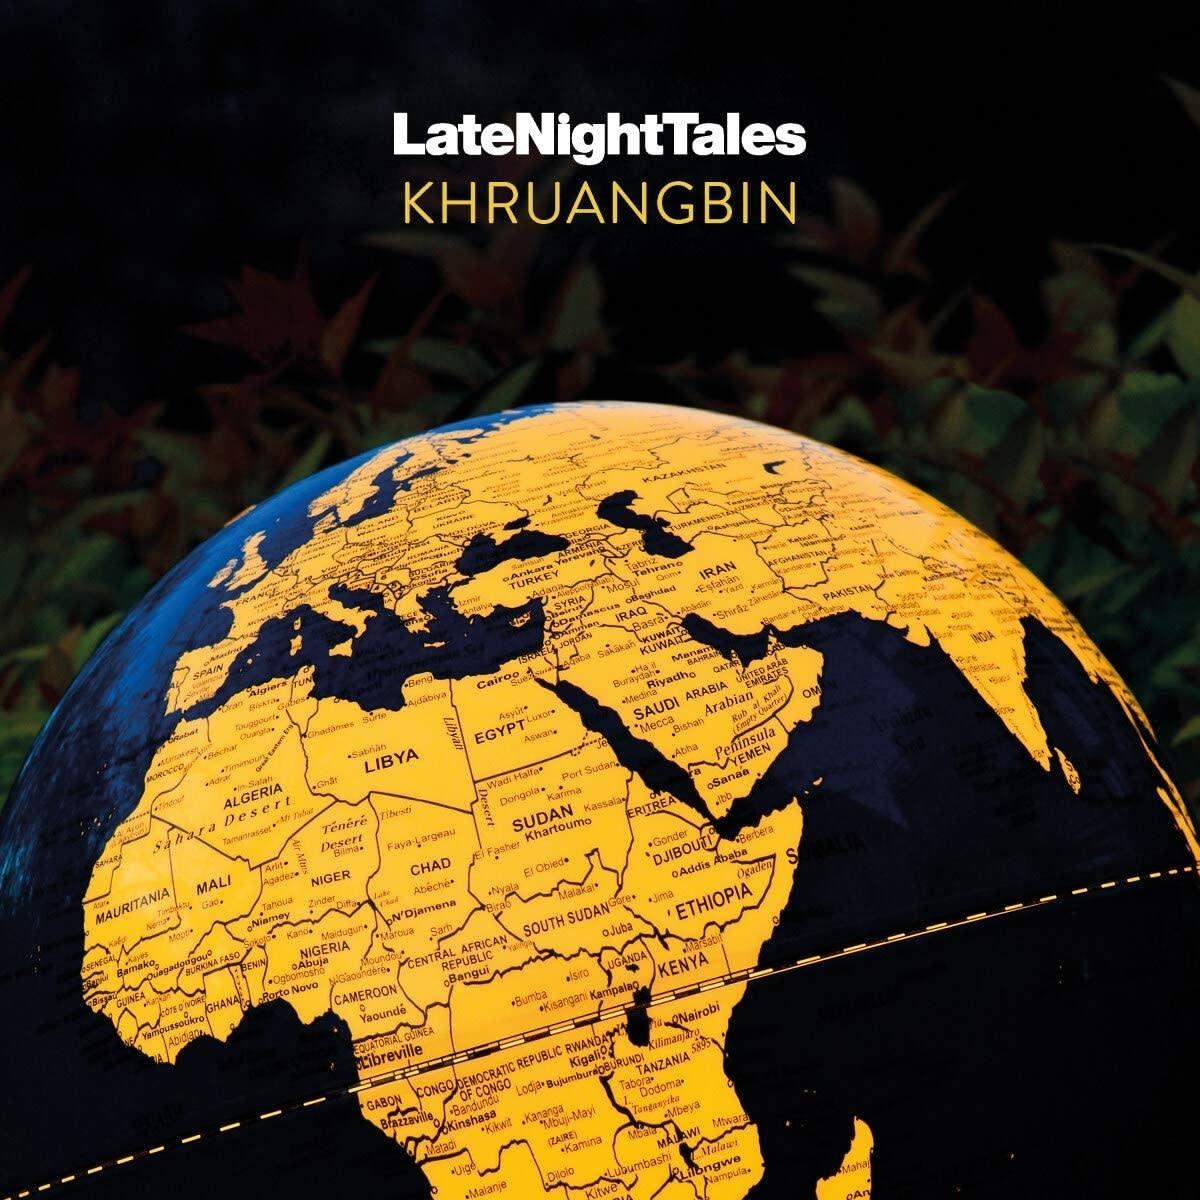 Khruangbin – LateNightTales